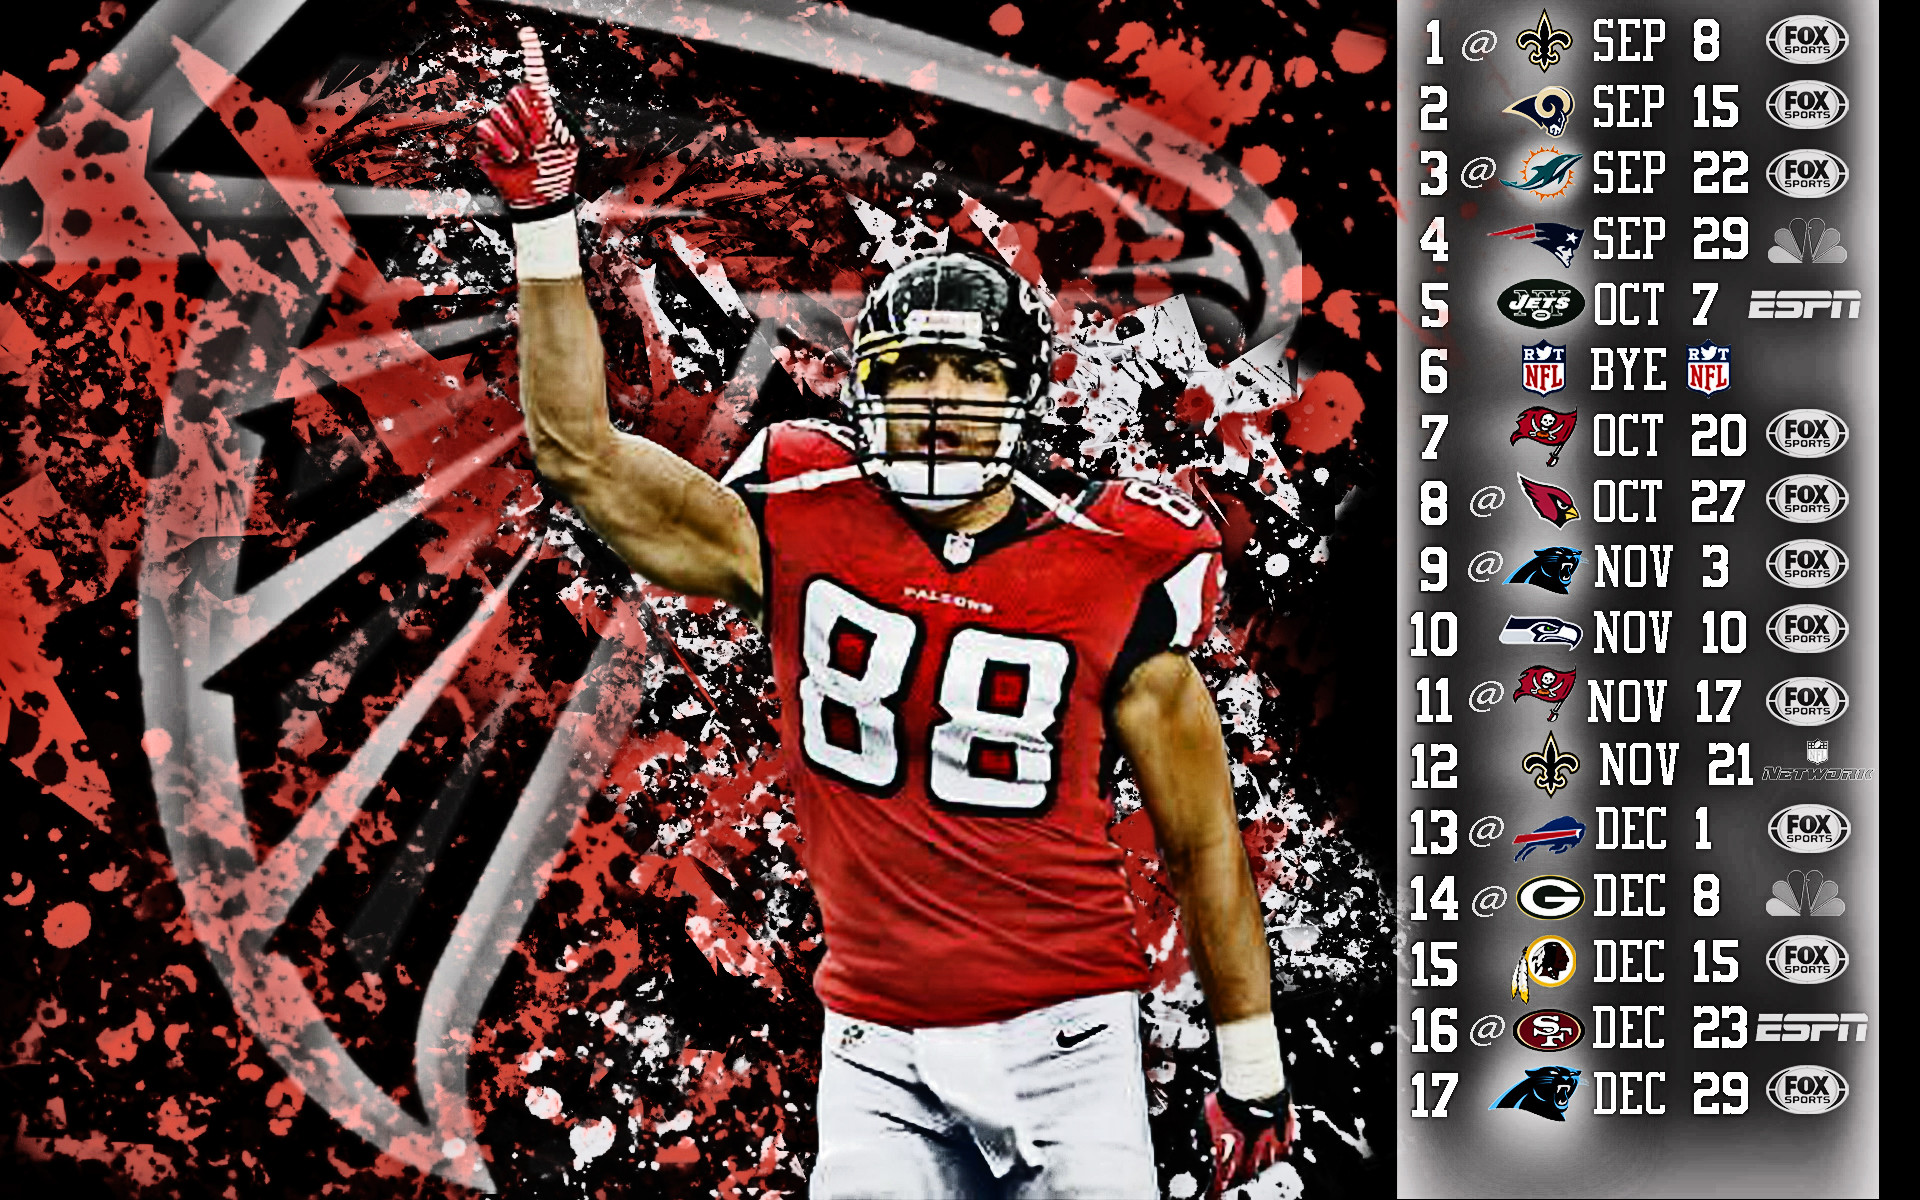 Hd Atlanta Falcons Wallpapers: Atlanta Falcons 2018 Wallpaper HD (64+ Images